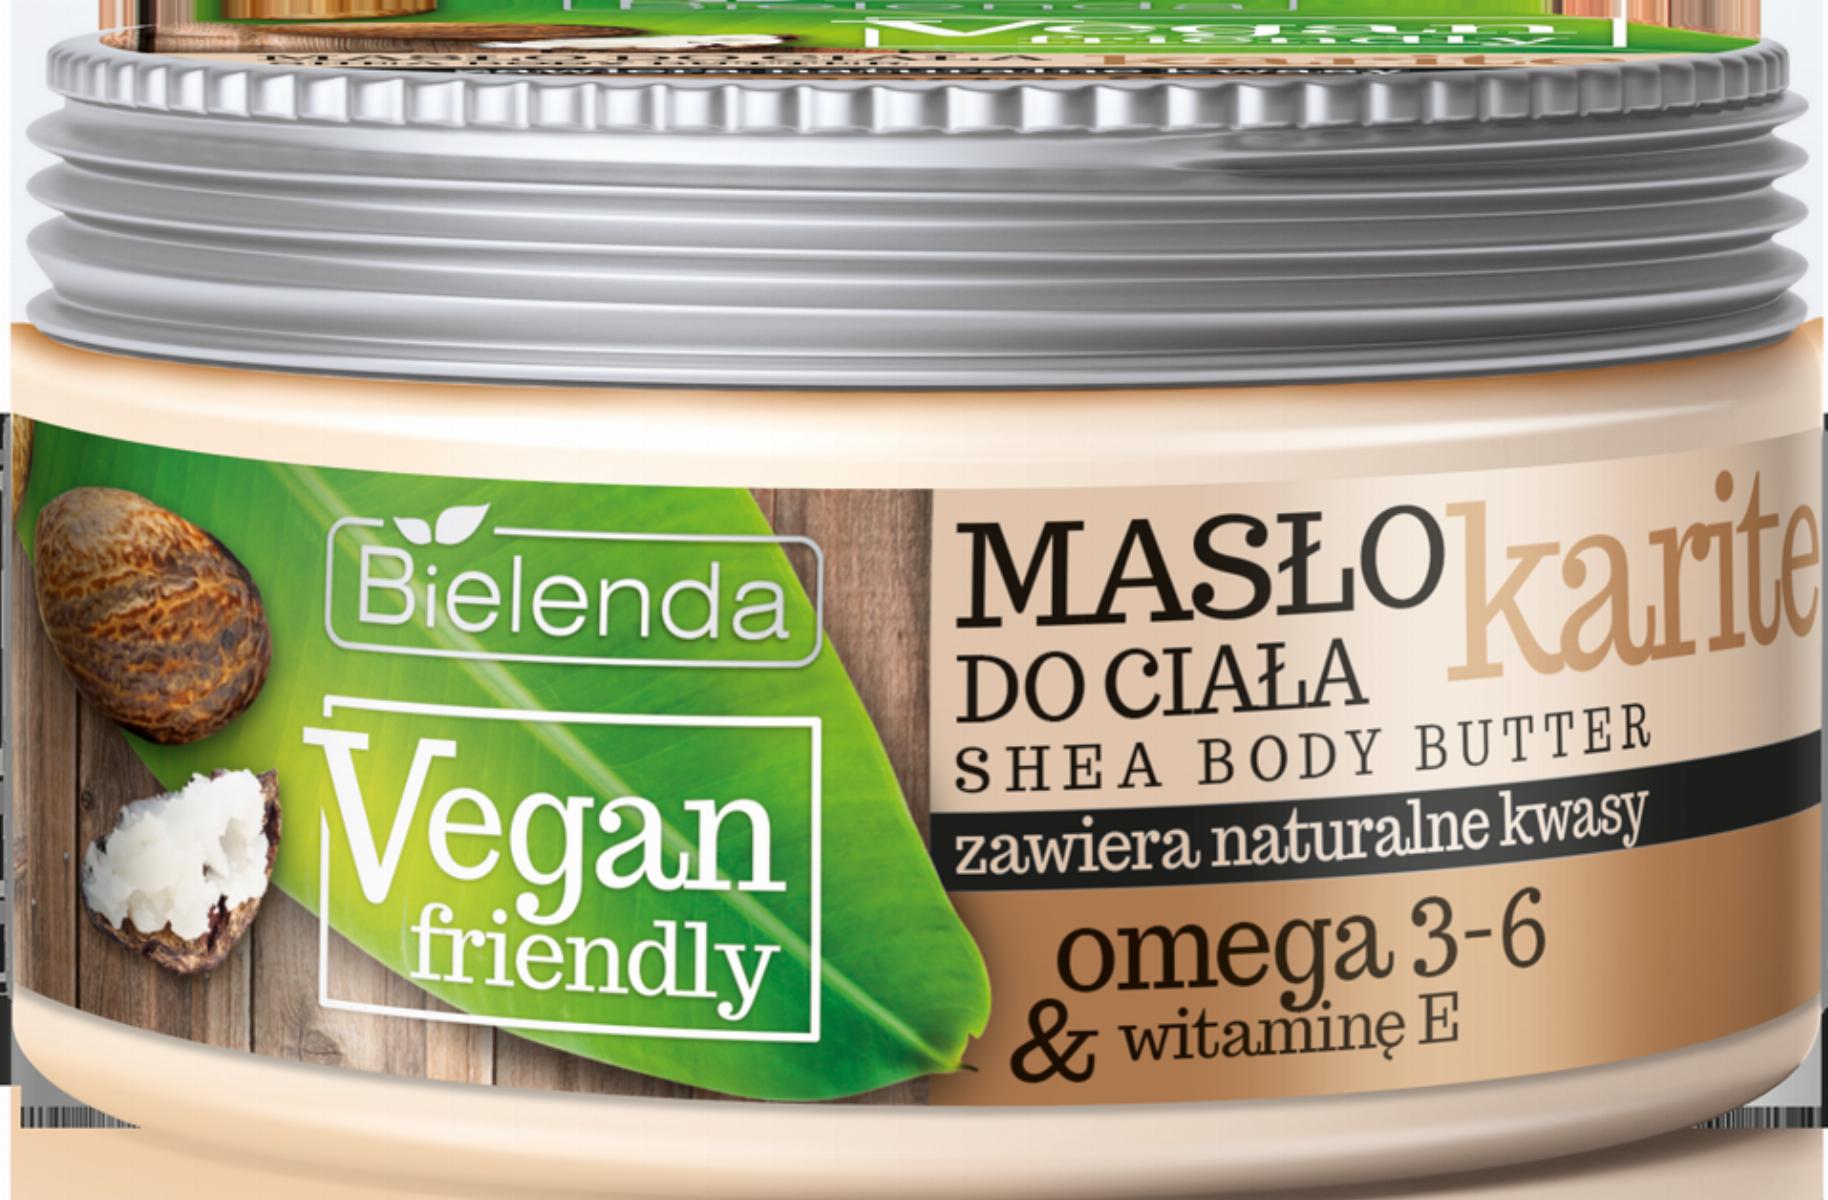 bielenda-vegan-friendly-maslo-do-ciala-karite